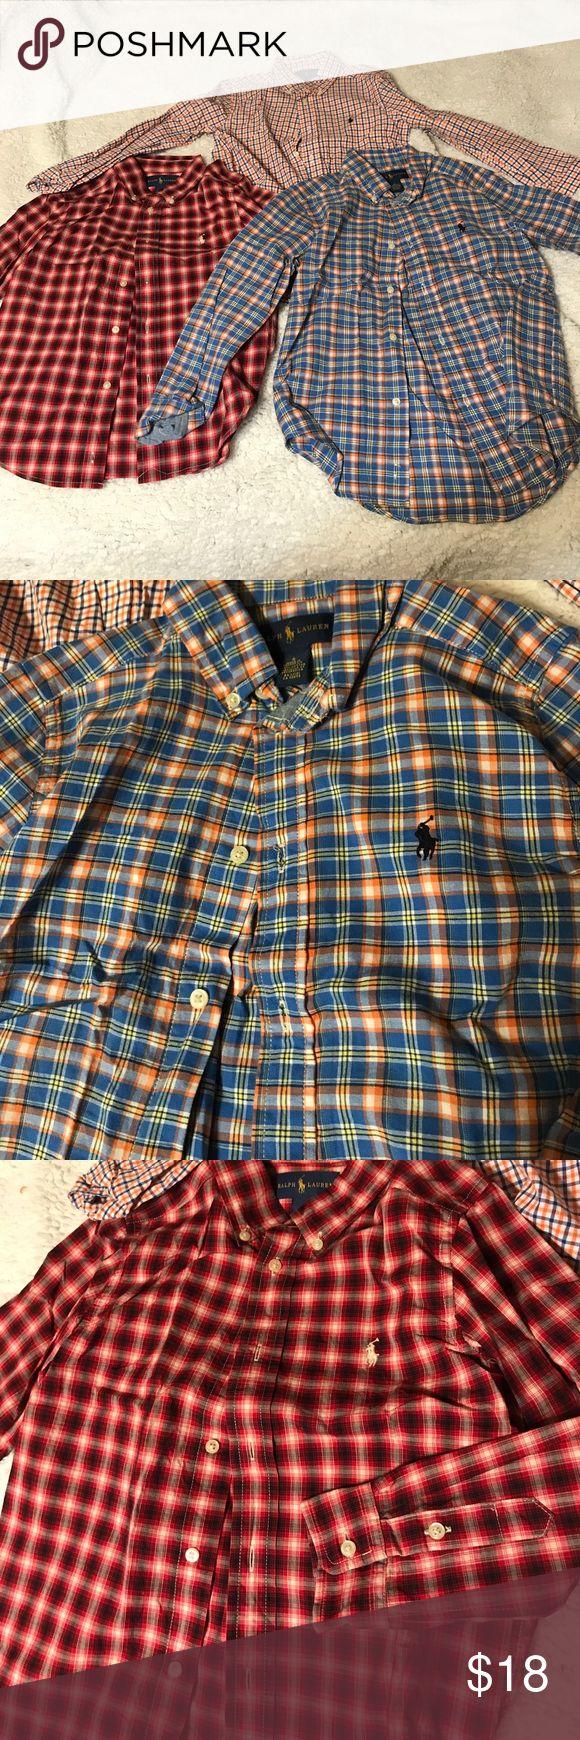 Ralph Laurn kids button down 3 shirts long sleeve Lauren Ralph Lauren Shirts & Tops Button Down Shirts